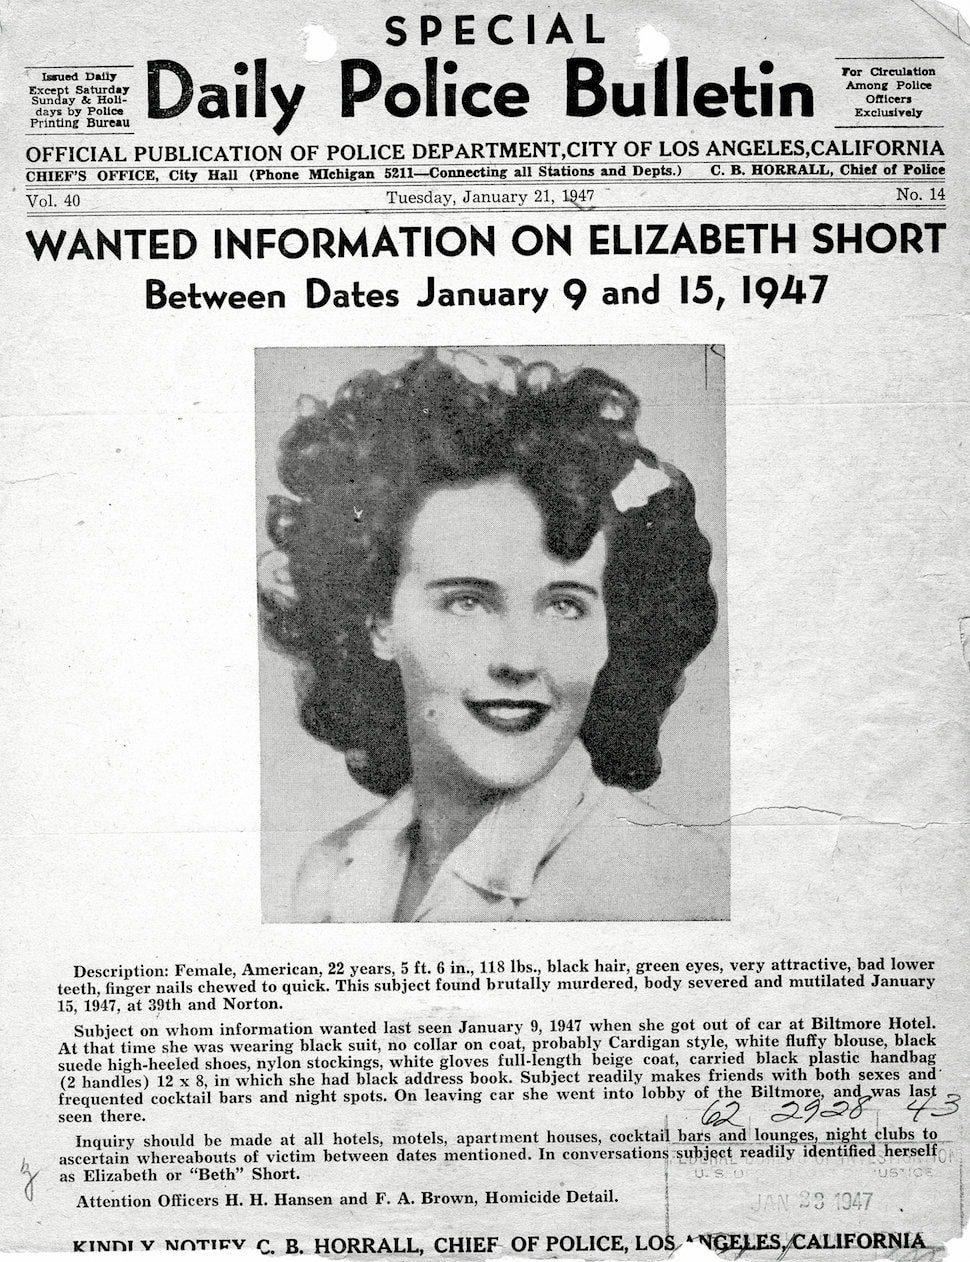 The Black Dahlia Police-FBI information request - crime